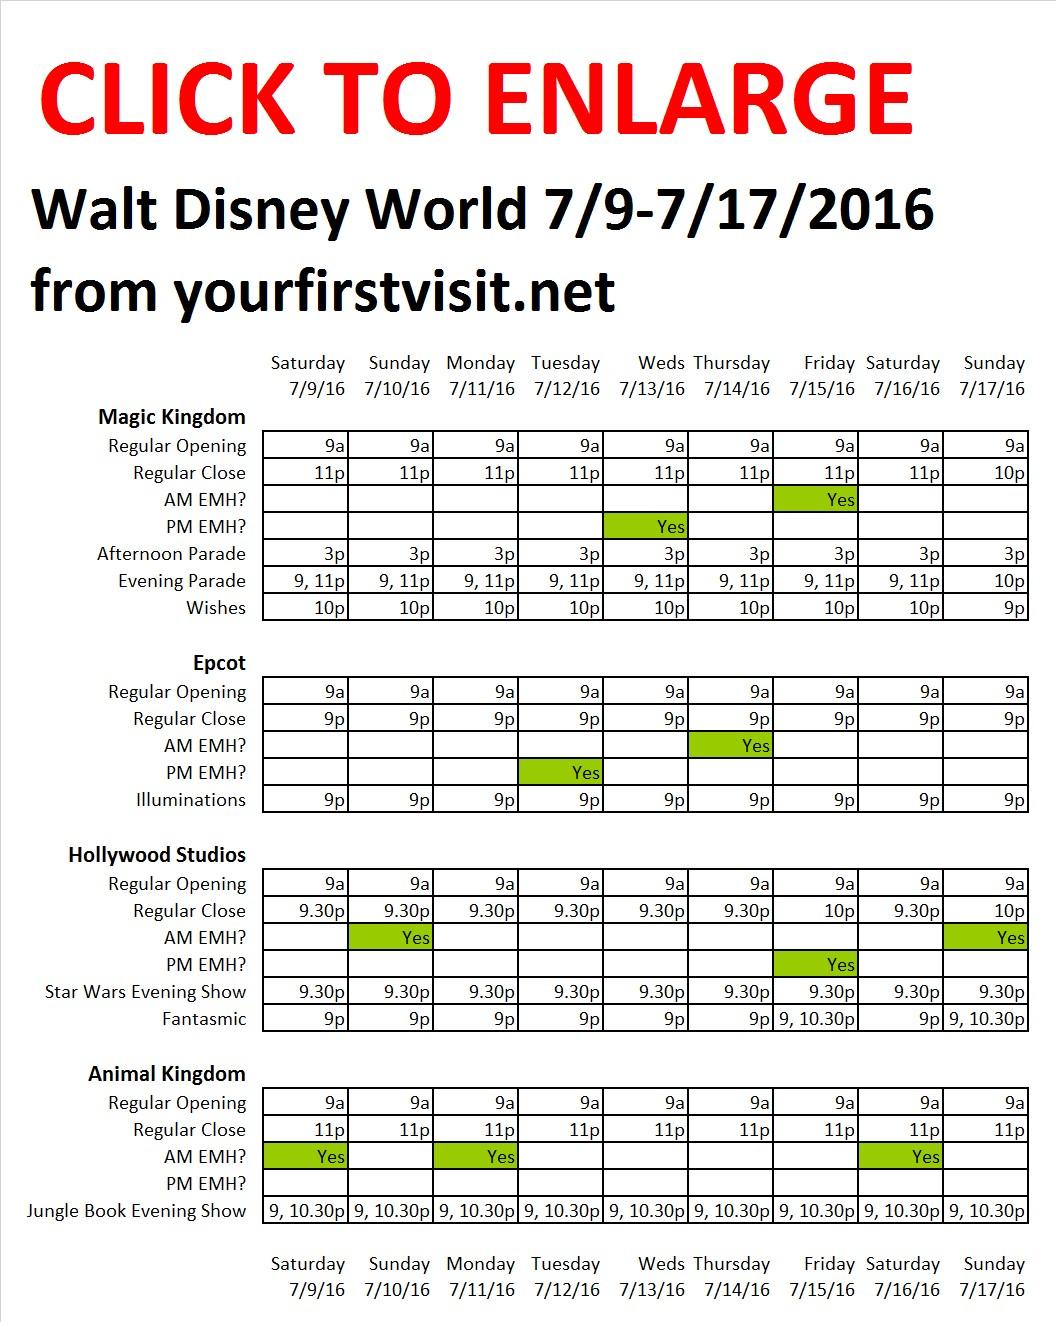 Disney World 7-9 to 7-17-2016 from yourfirstvisit.net